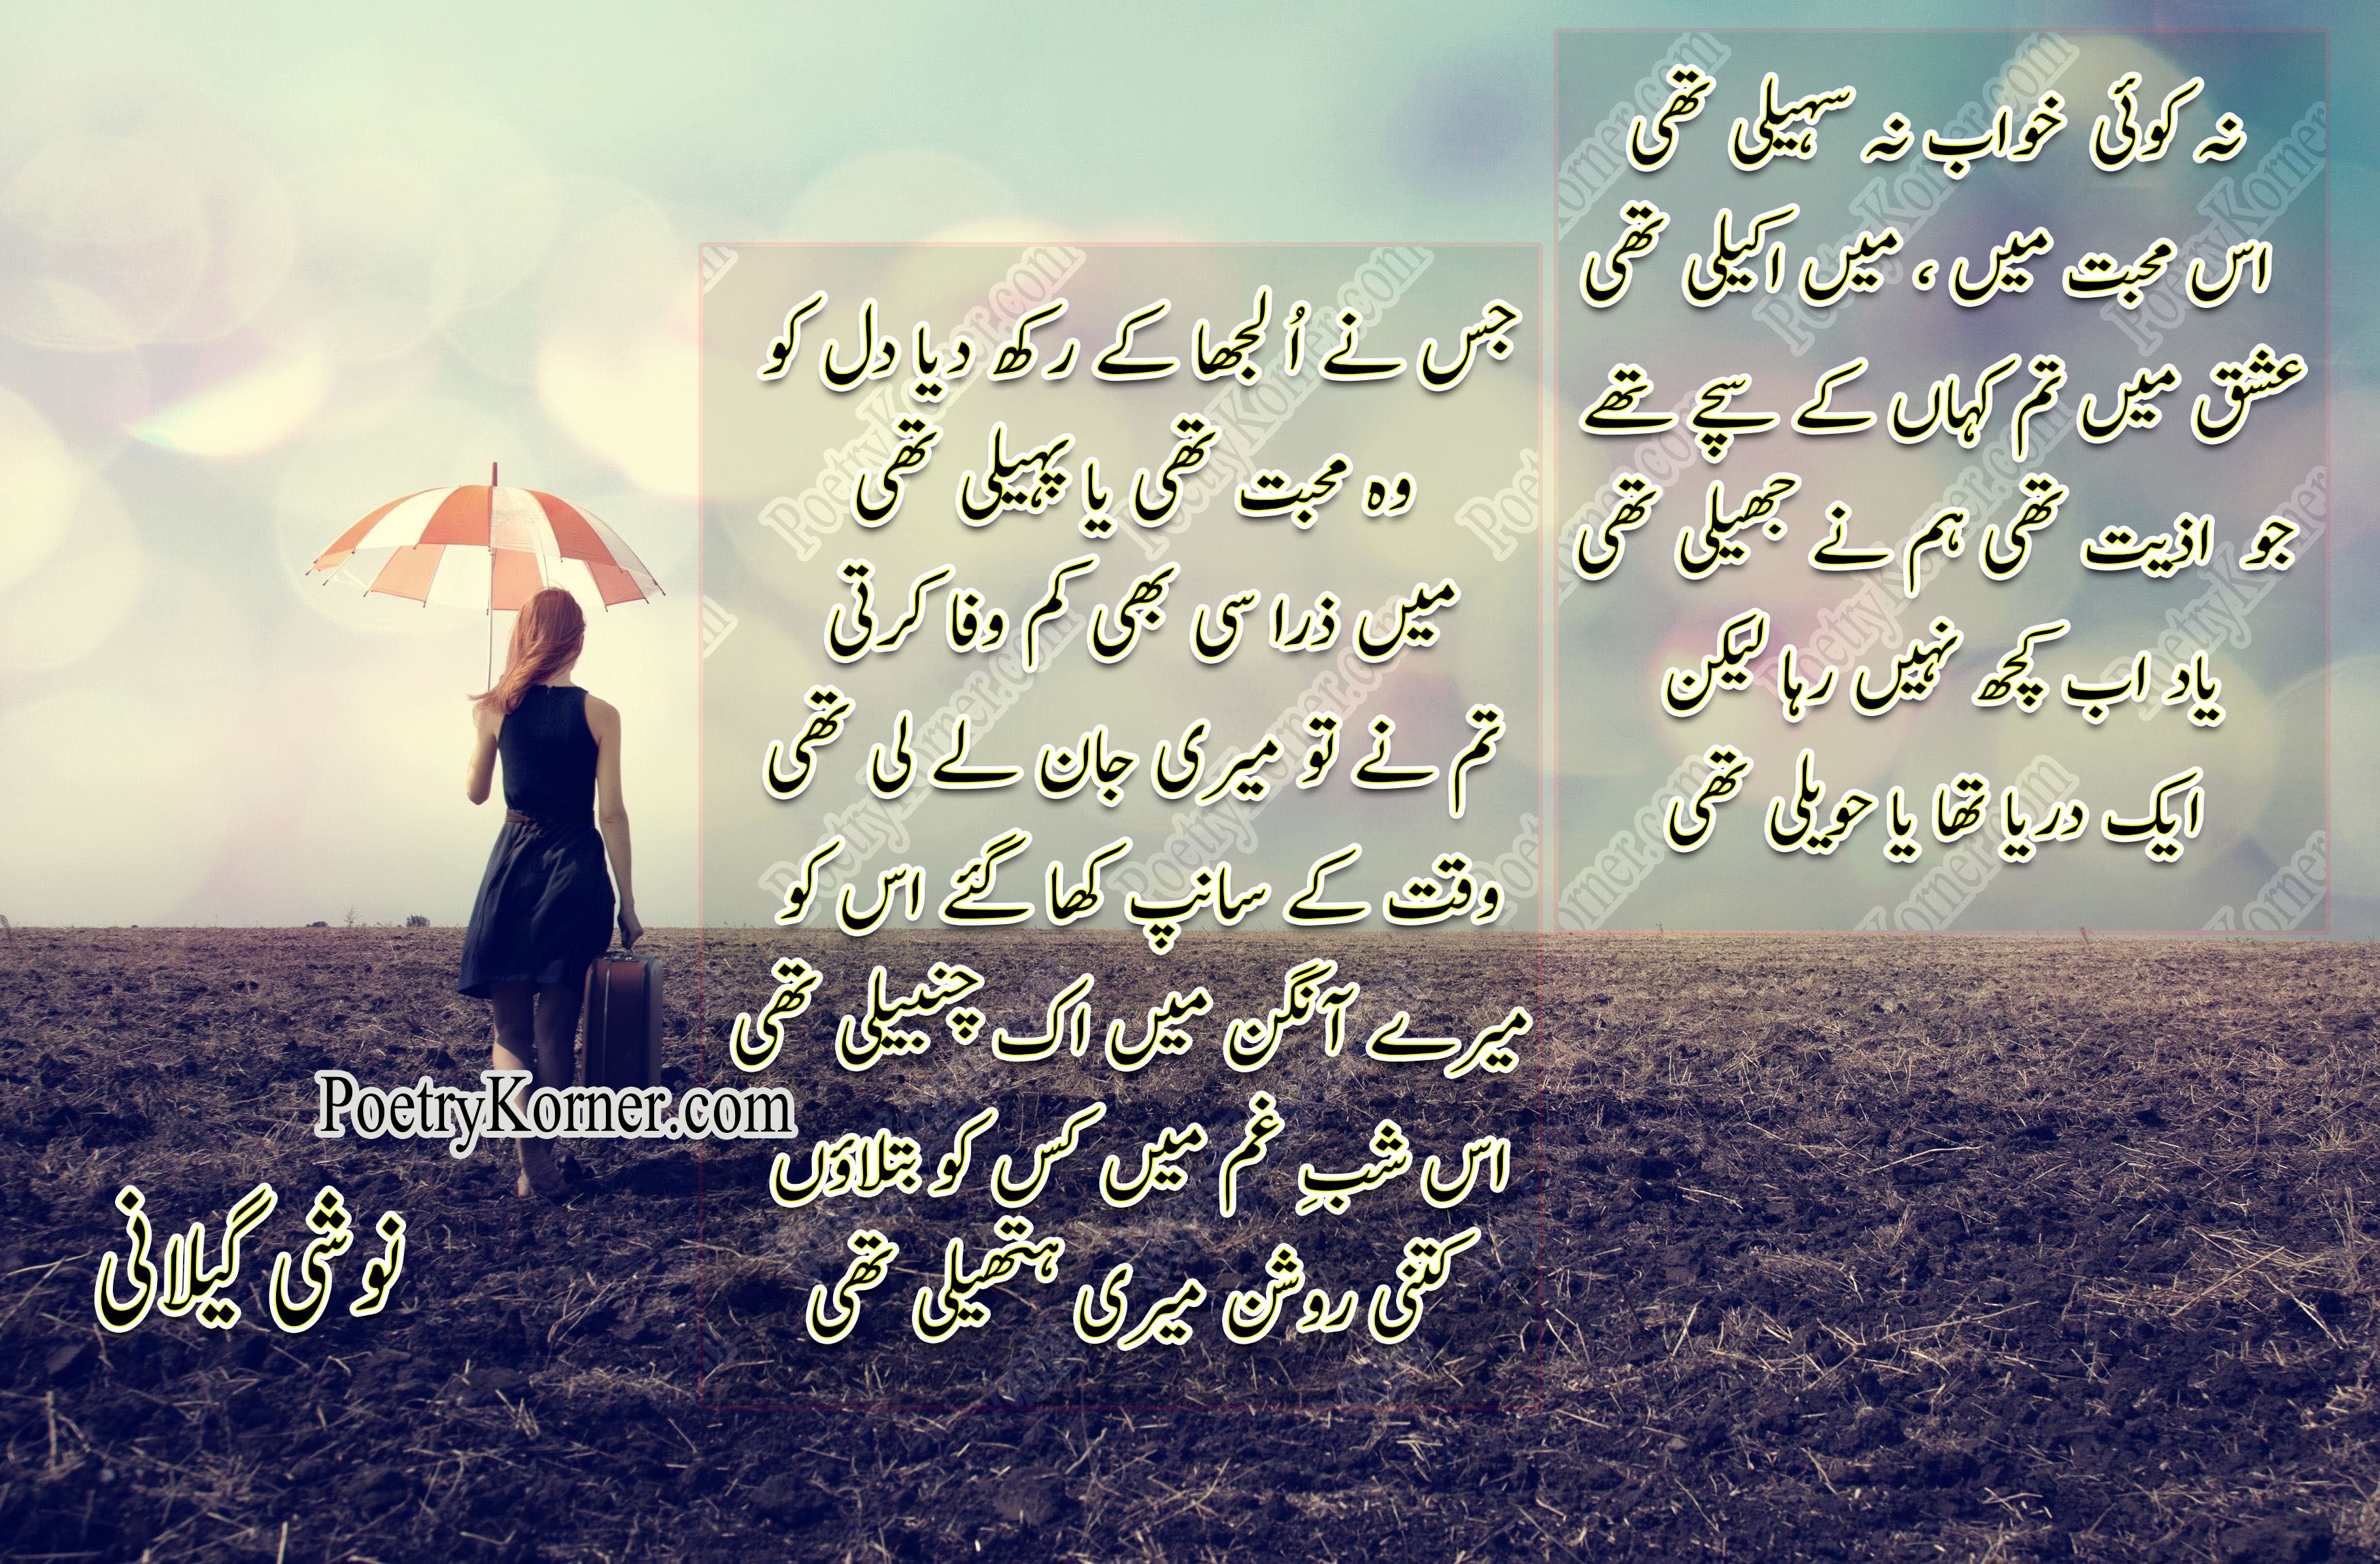 awesome Urdu Poetry Noshi Gilani Naa Koi Khuwaab